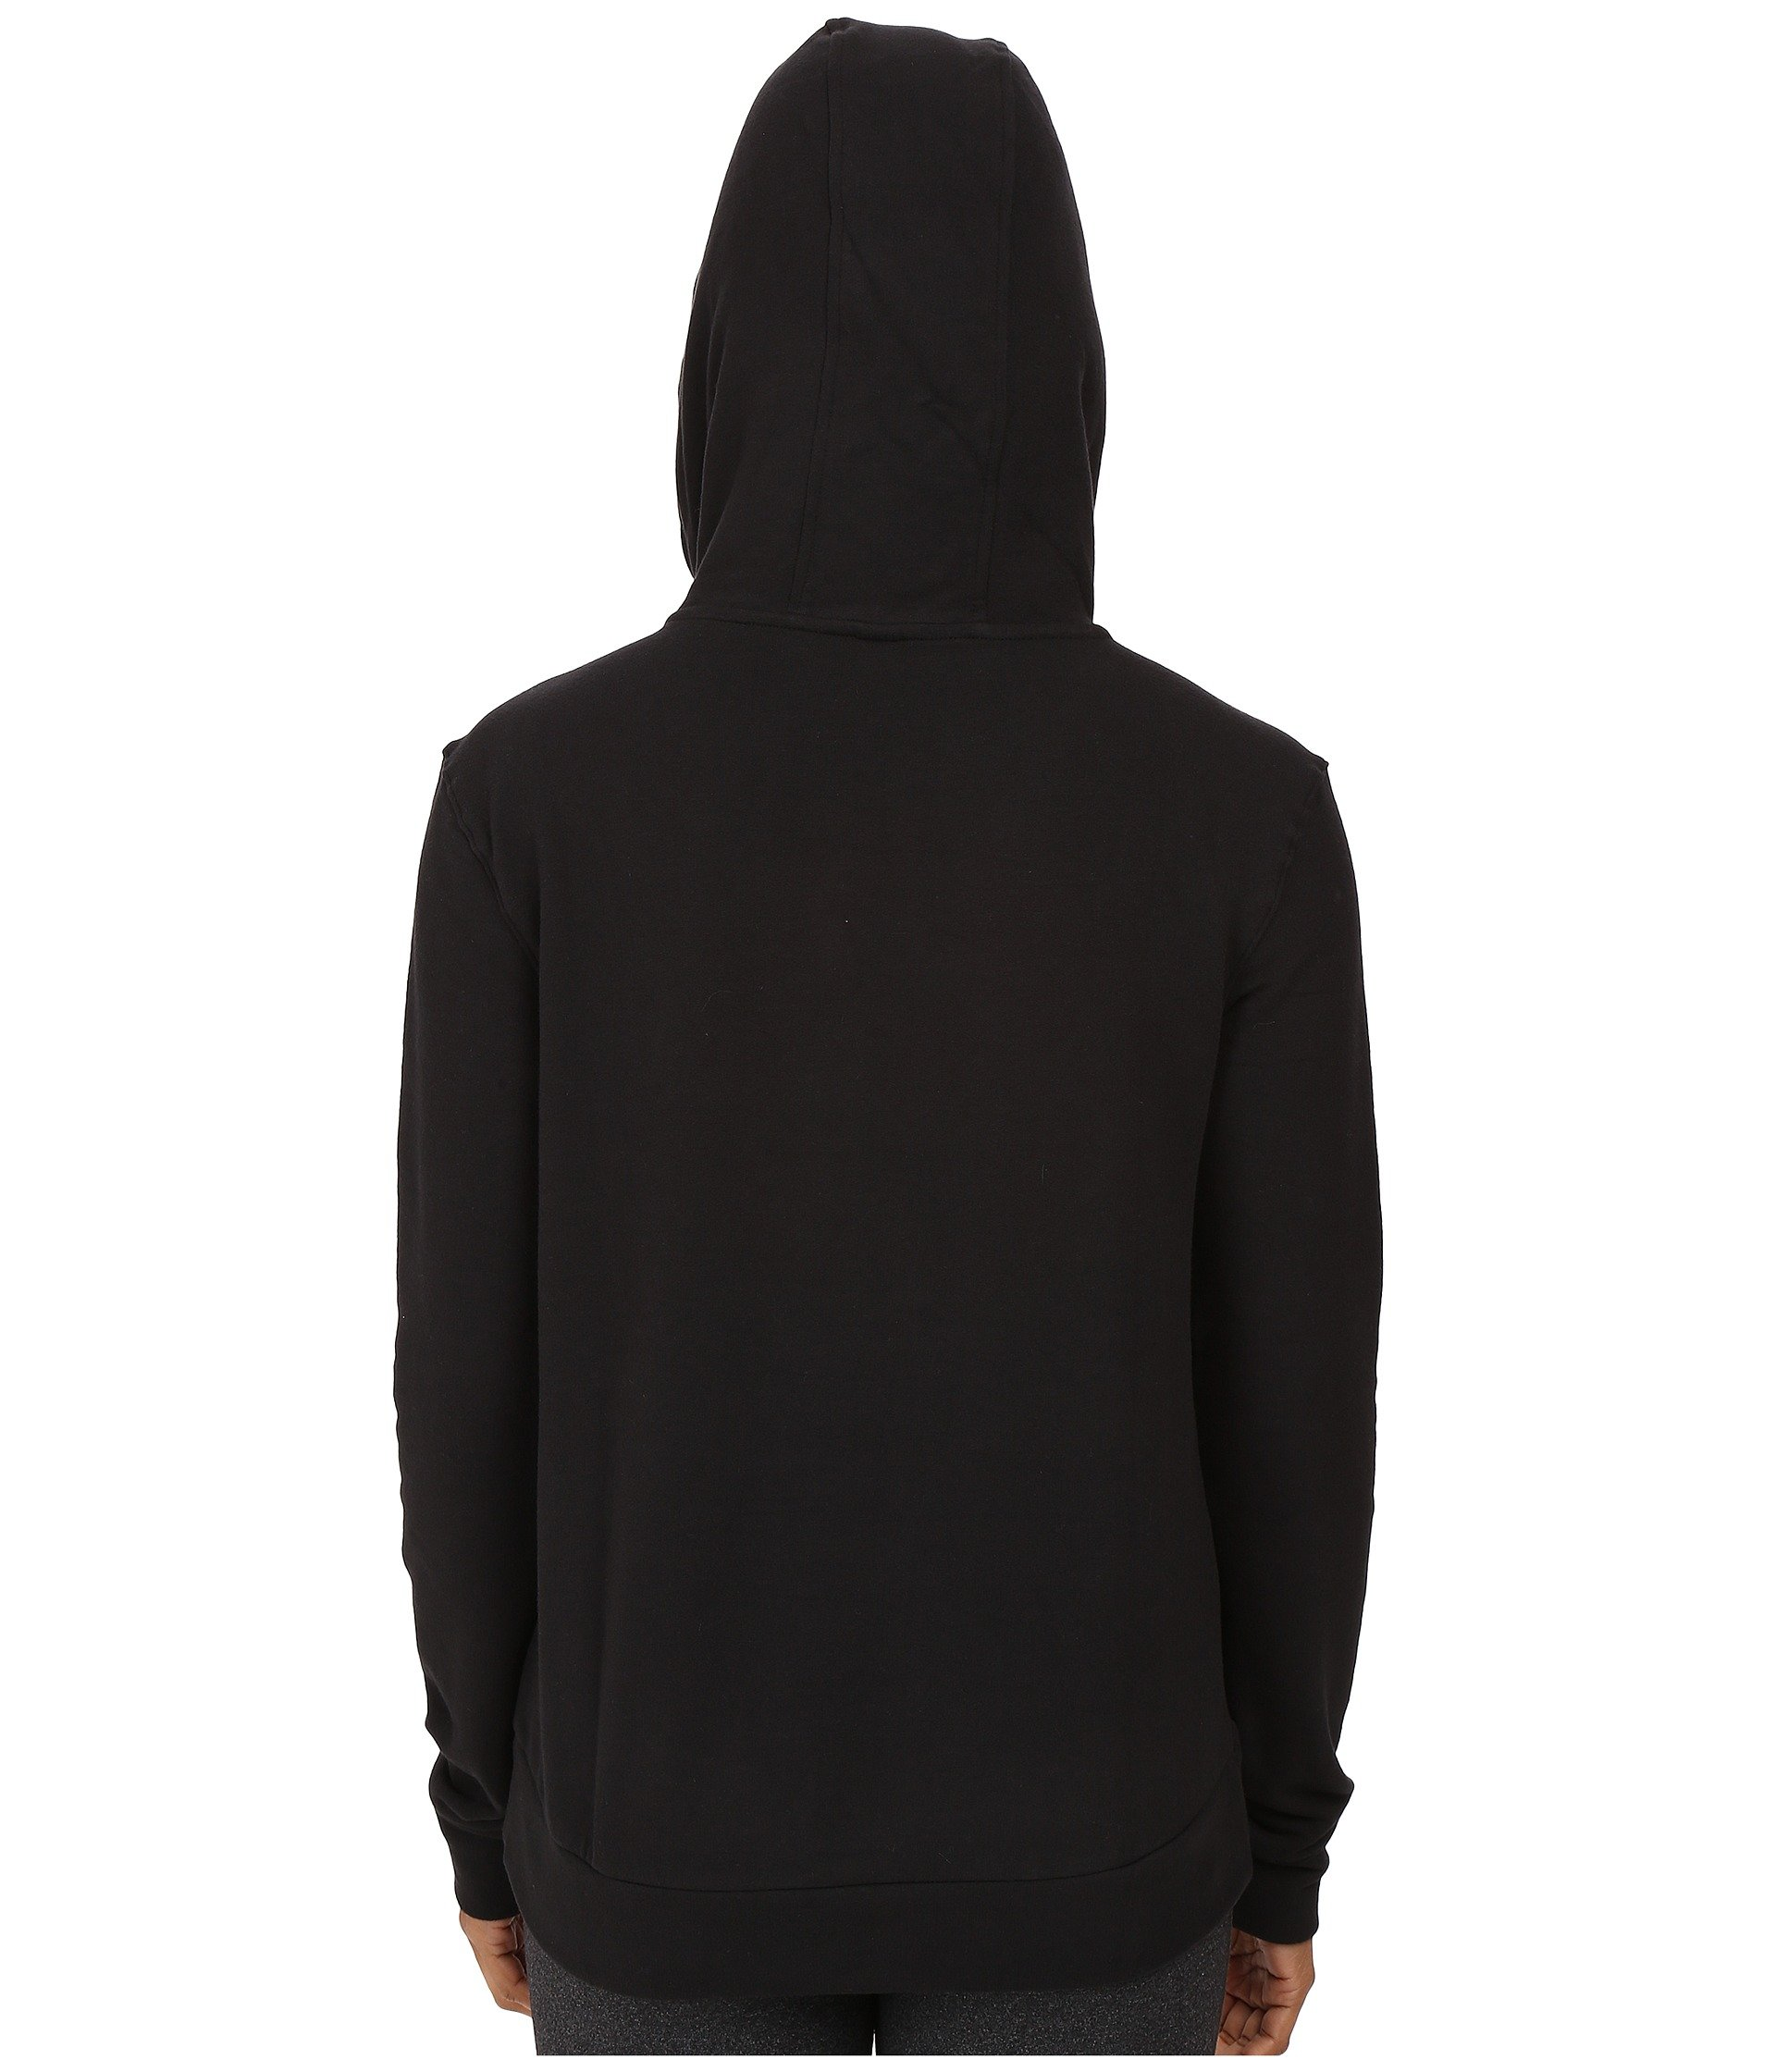 adidas originals 247365 pullover hoodie in black modesens. Black Bedroom Furniture Sets. Home Design Ideas